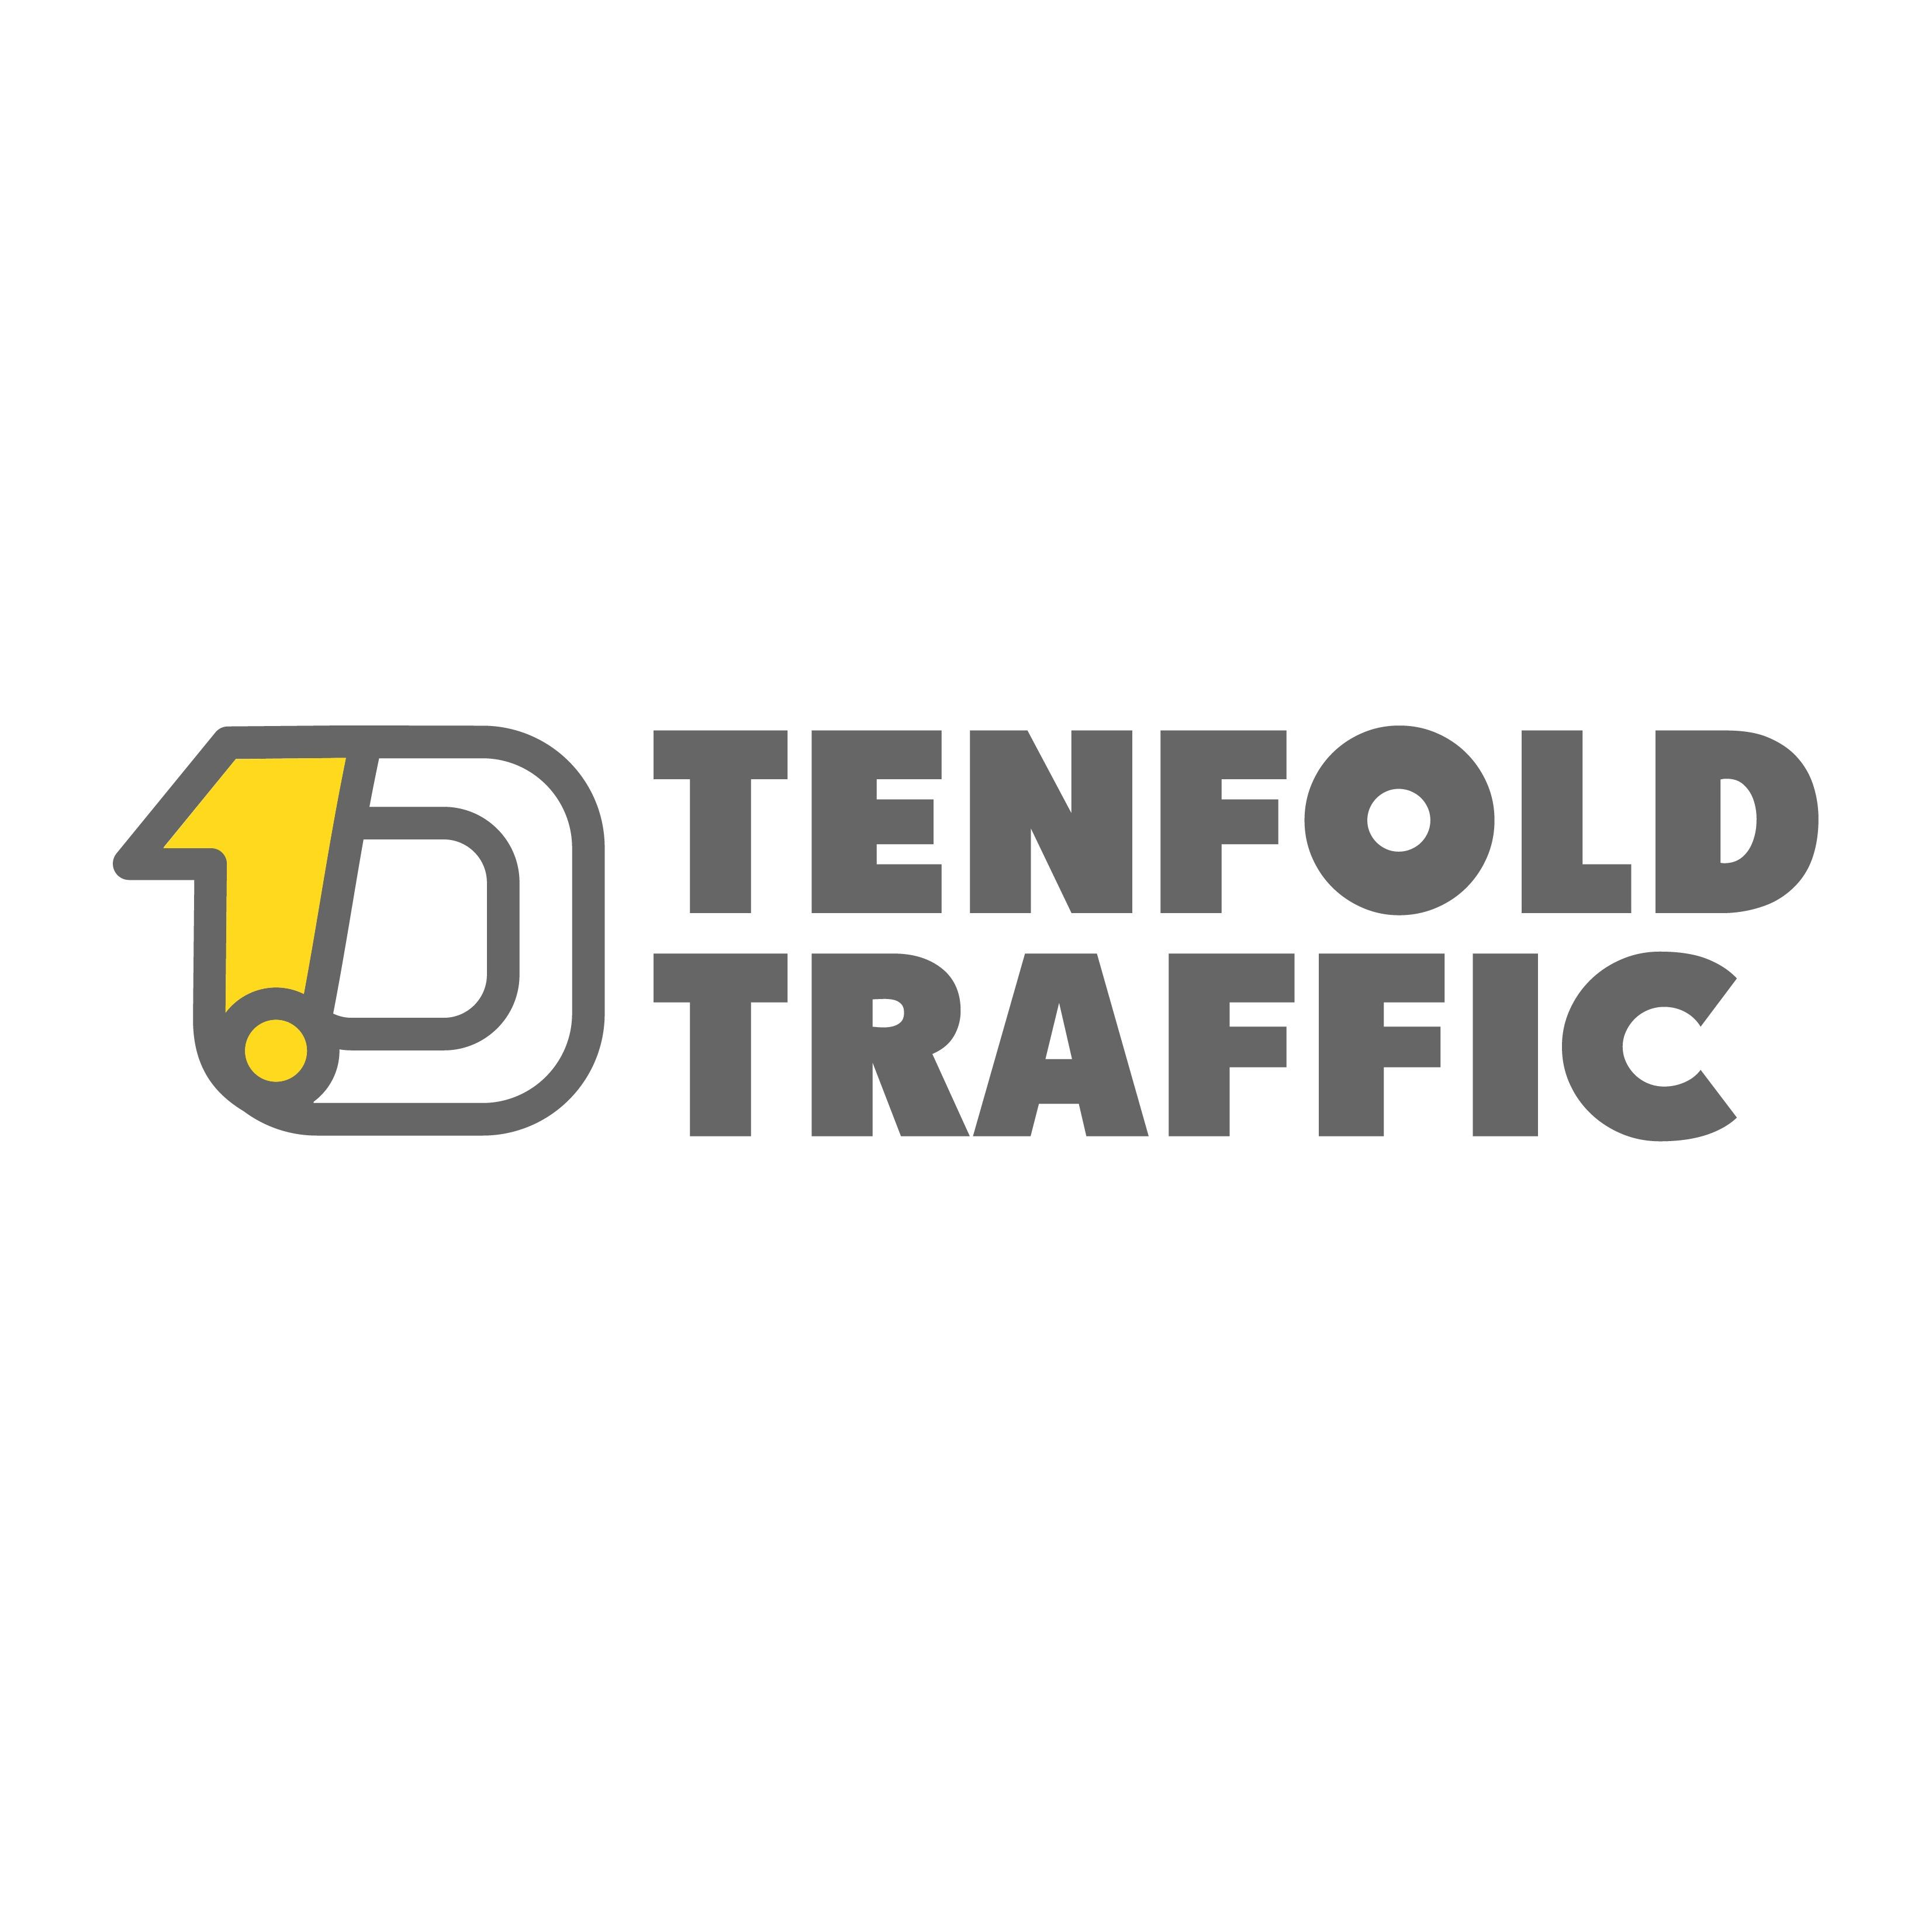 Tenfold Traffic